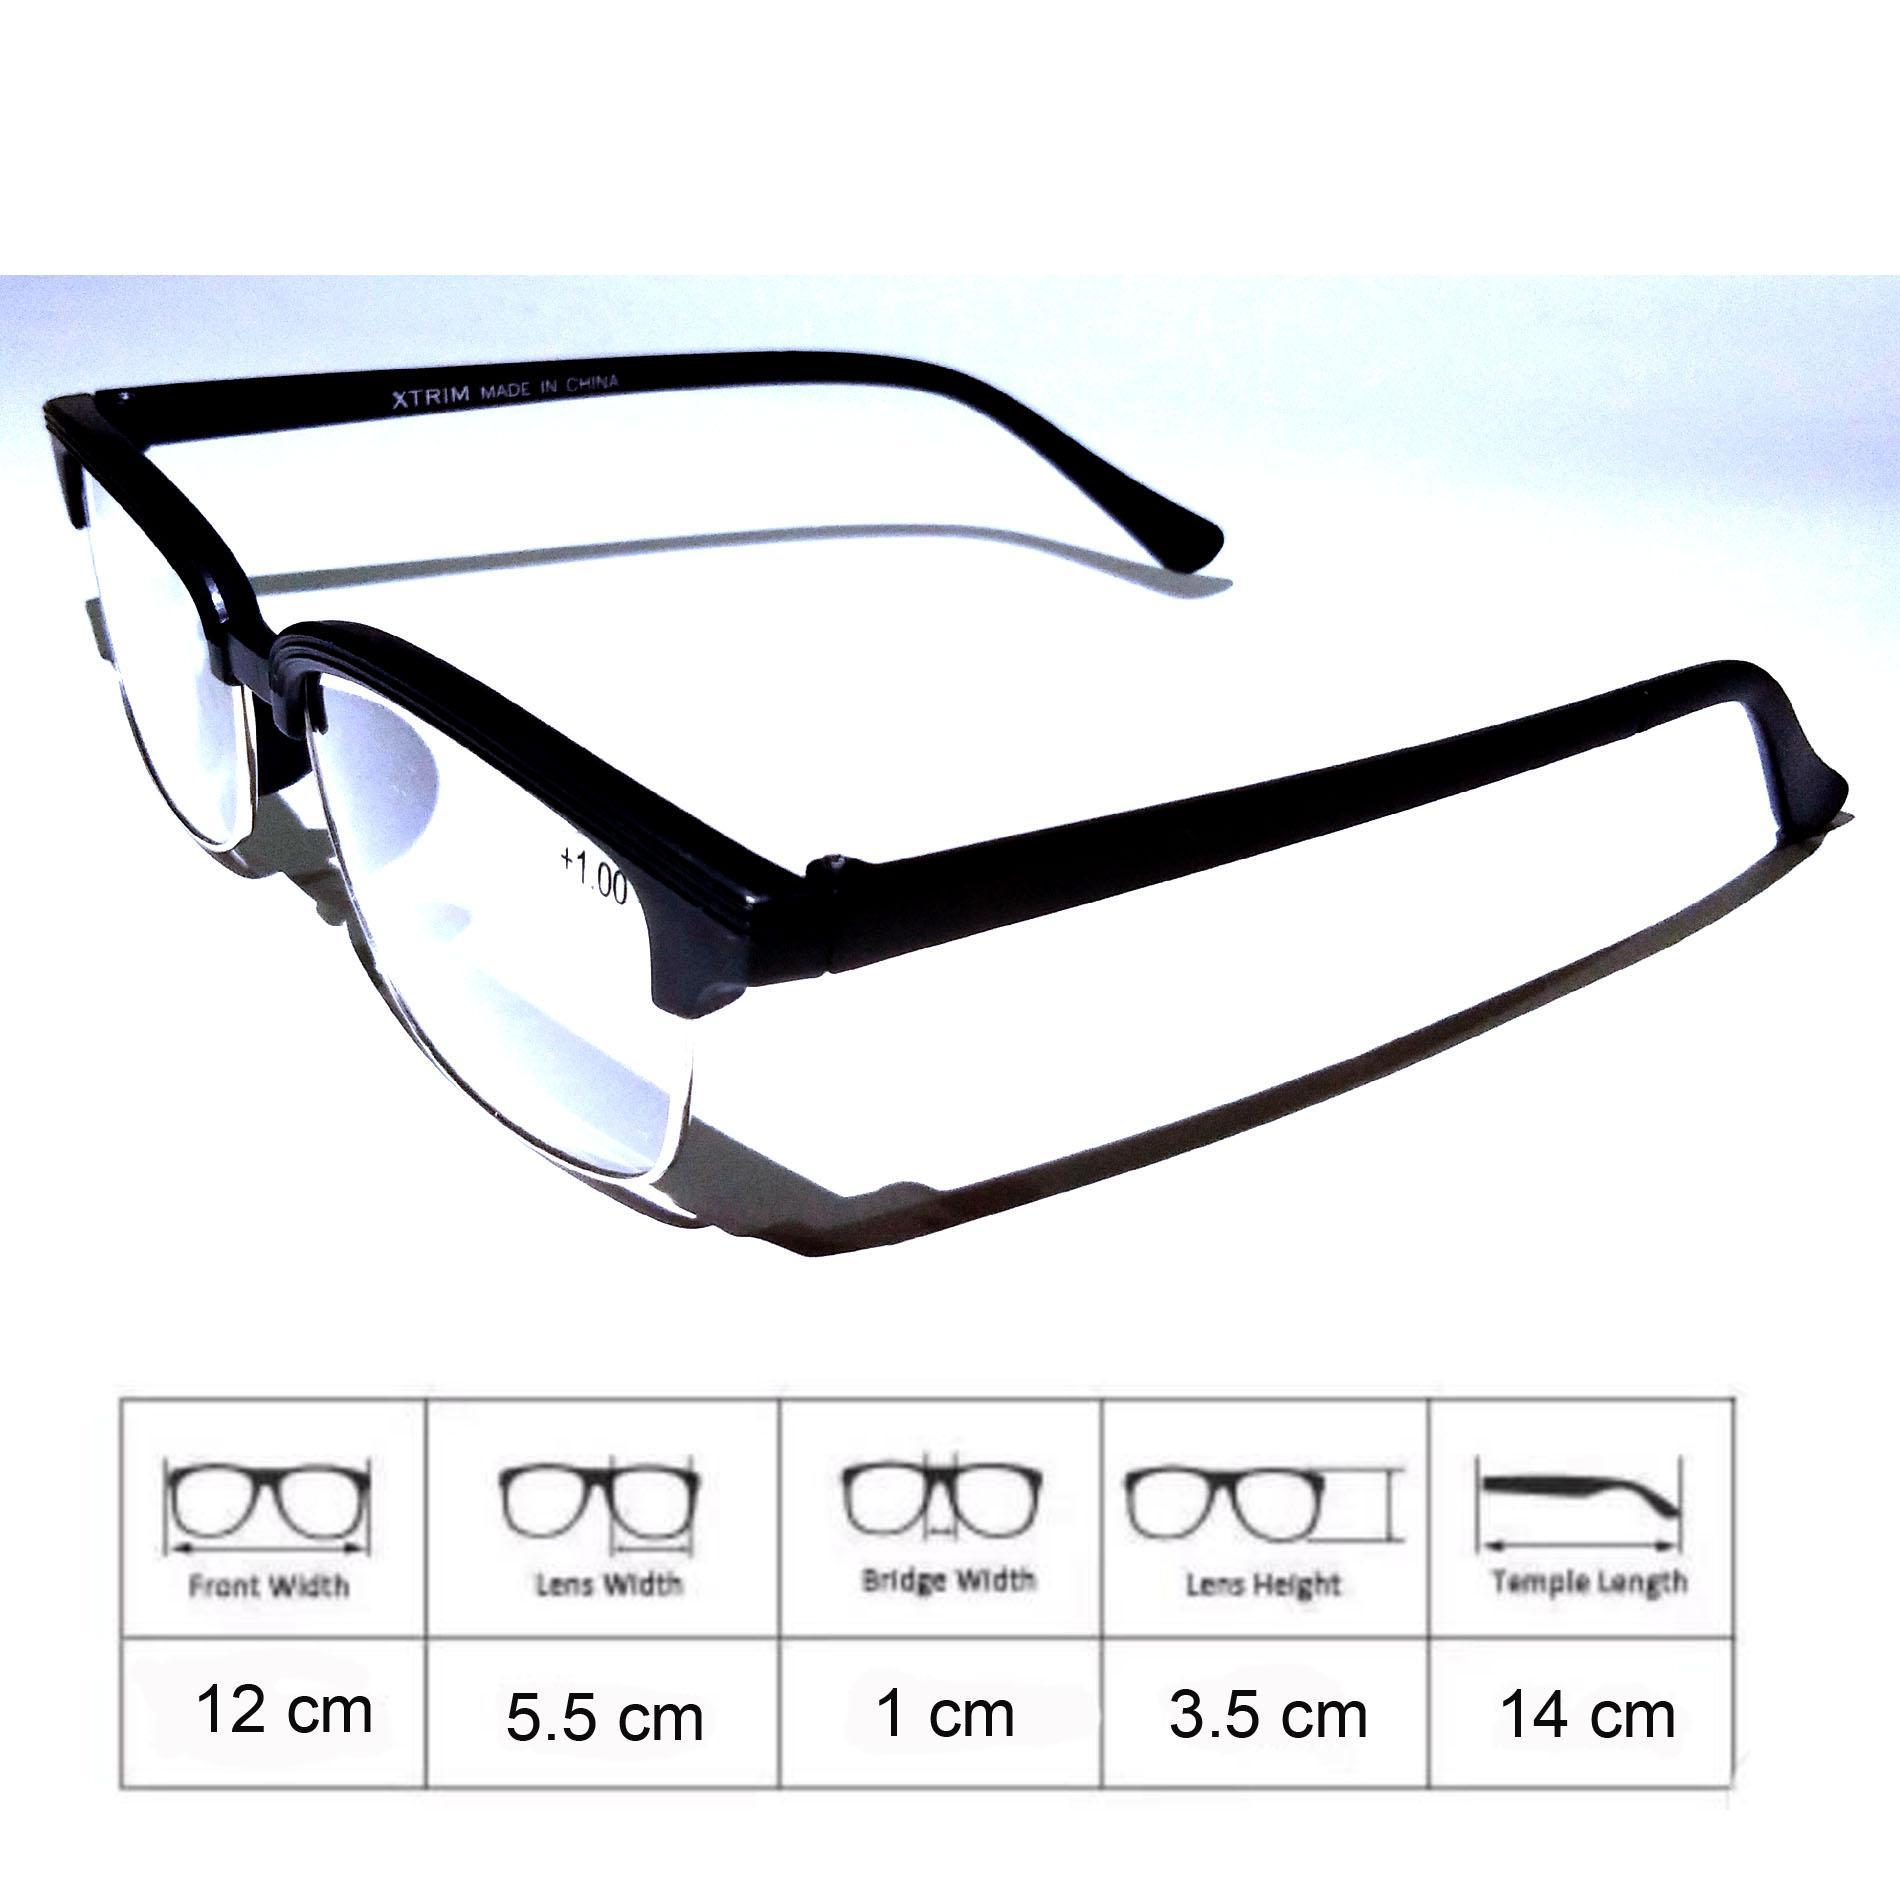 RAKA eyewear - Kacamata Baca Plus (+) Korean Style Kacamata Baca Fashion  untuk Pria c0d84f192a